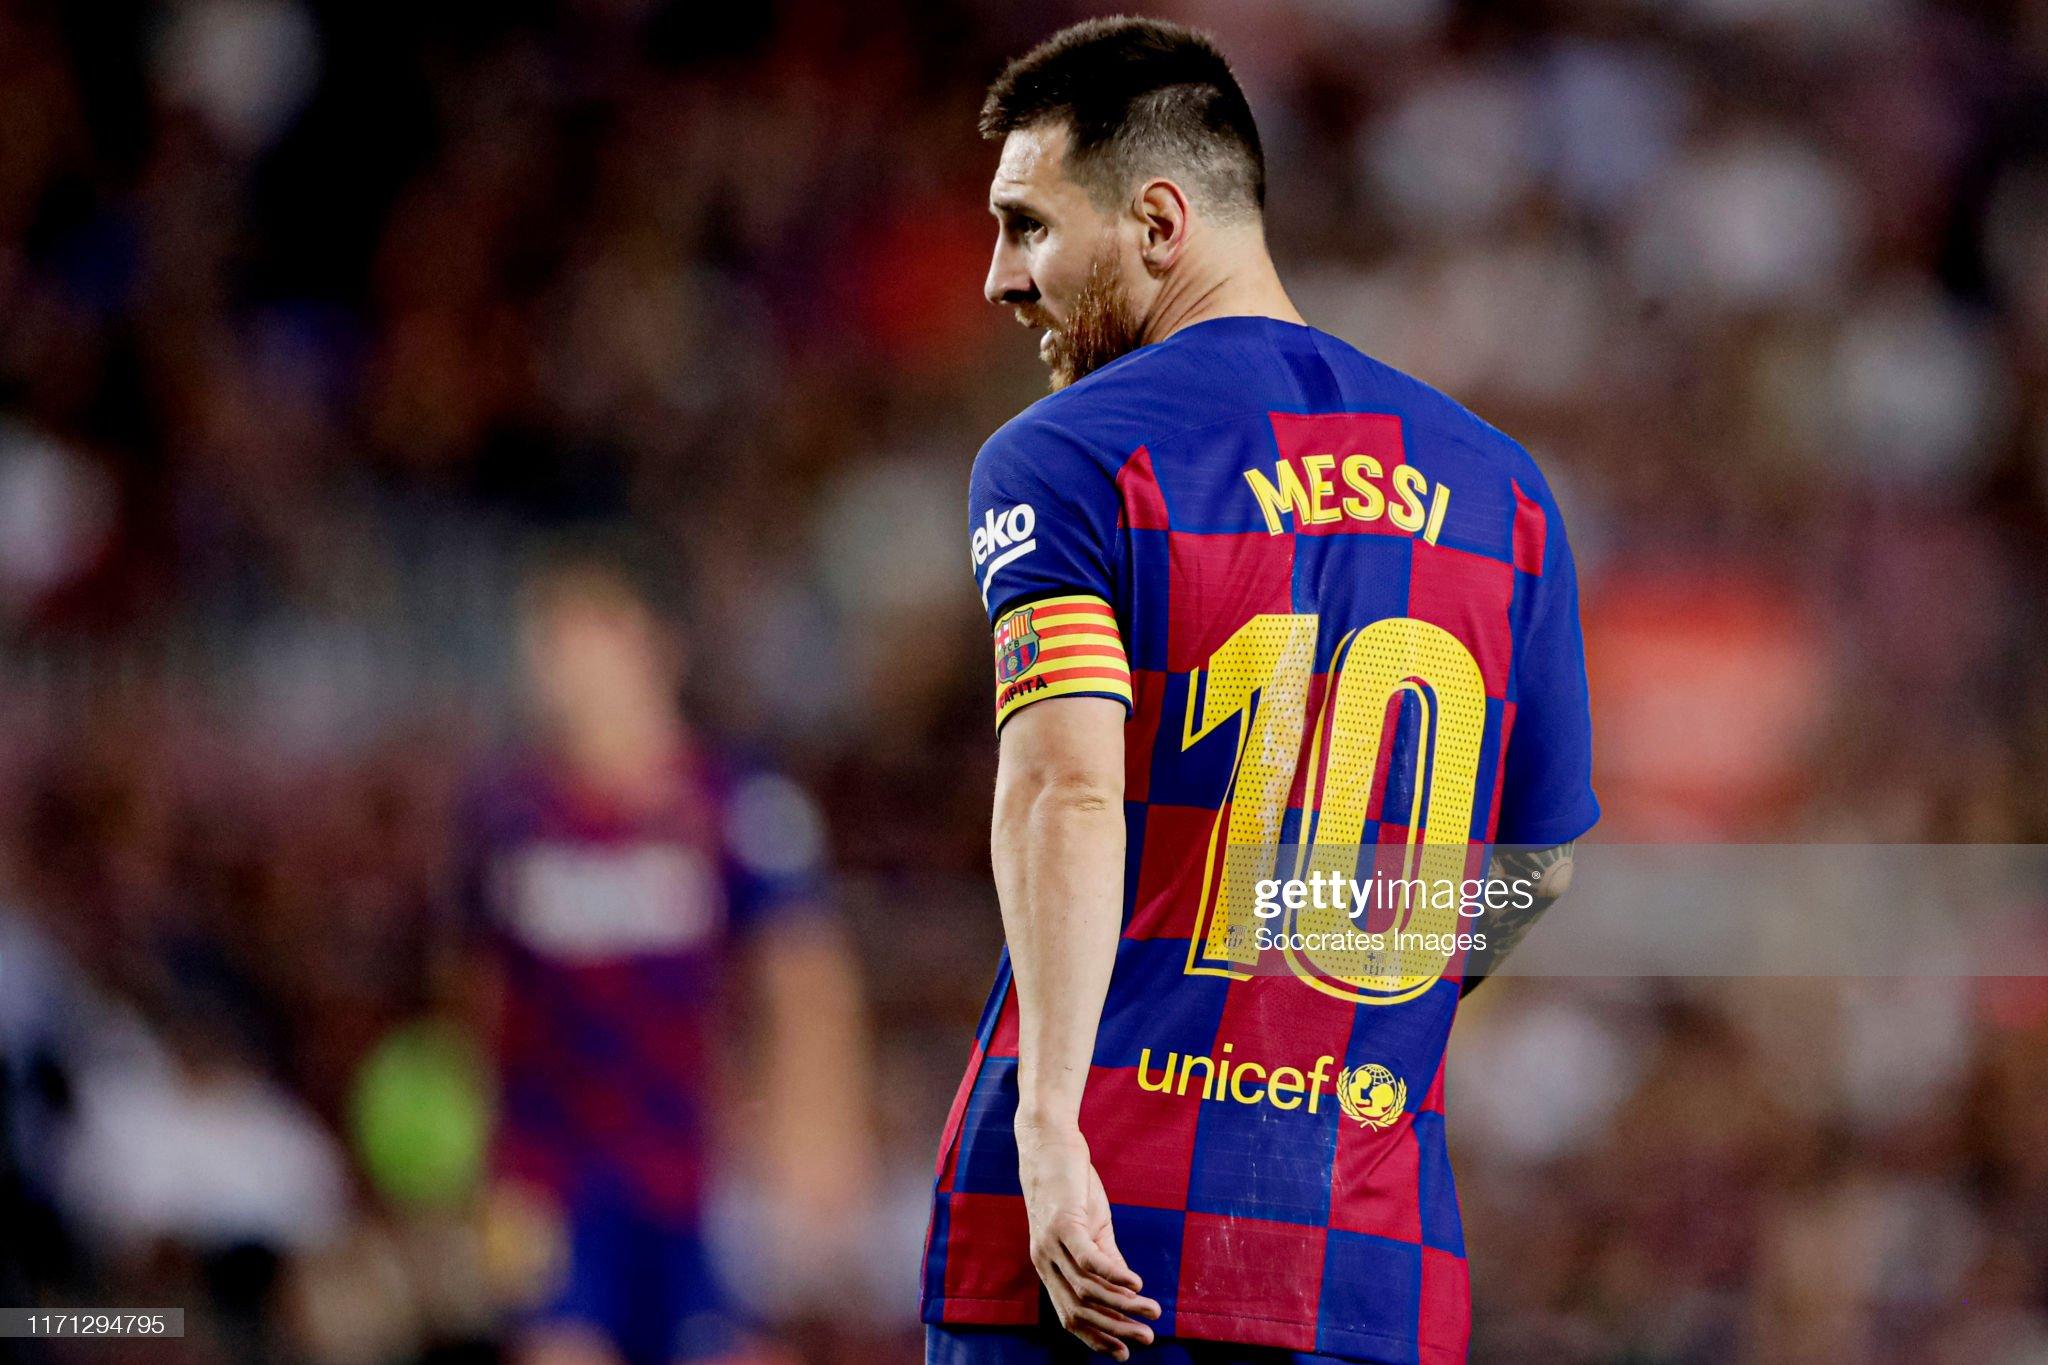 صور مباراة : برشلونة - فياريال 2-1 ( 24-09-2019 )  Lionel-messi-of-fc-barcelona-during-the-la-liga-santander-match-fc-picture-id1171294795?s=2048x2048